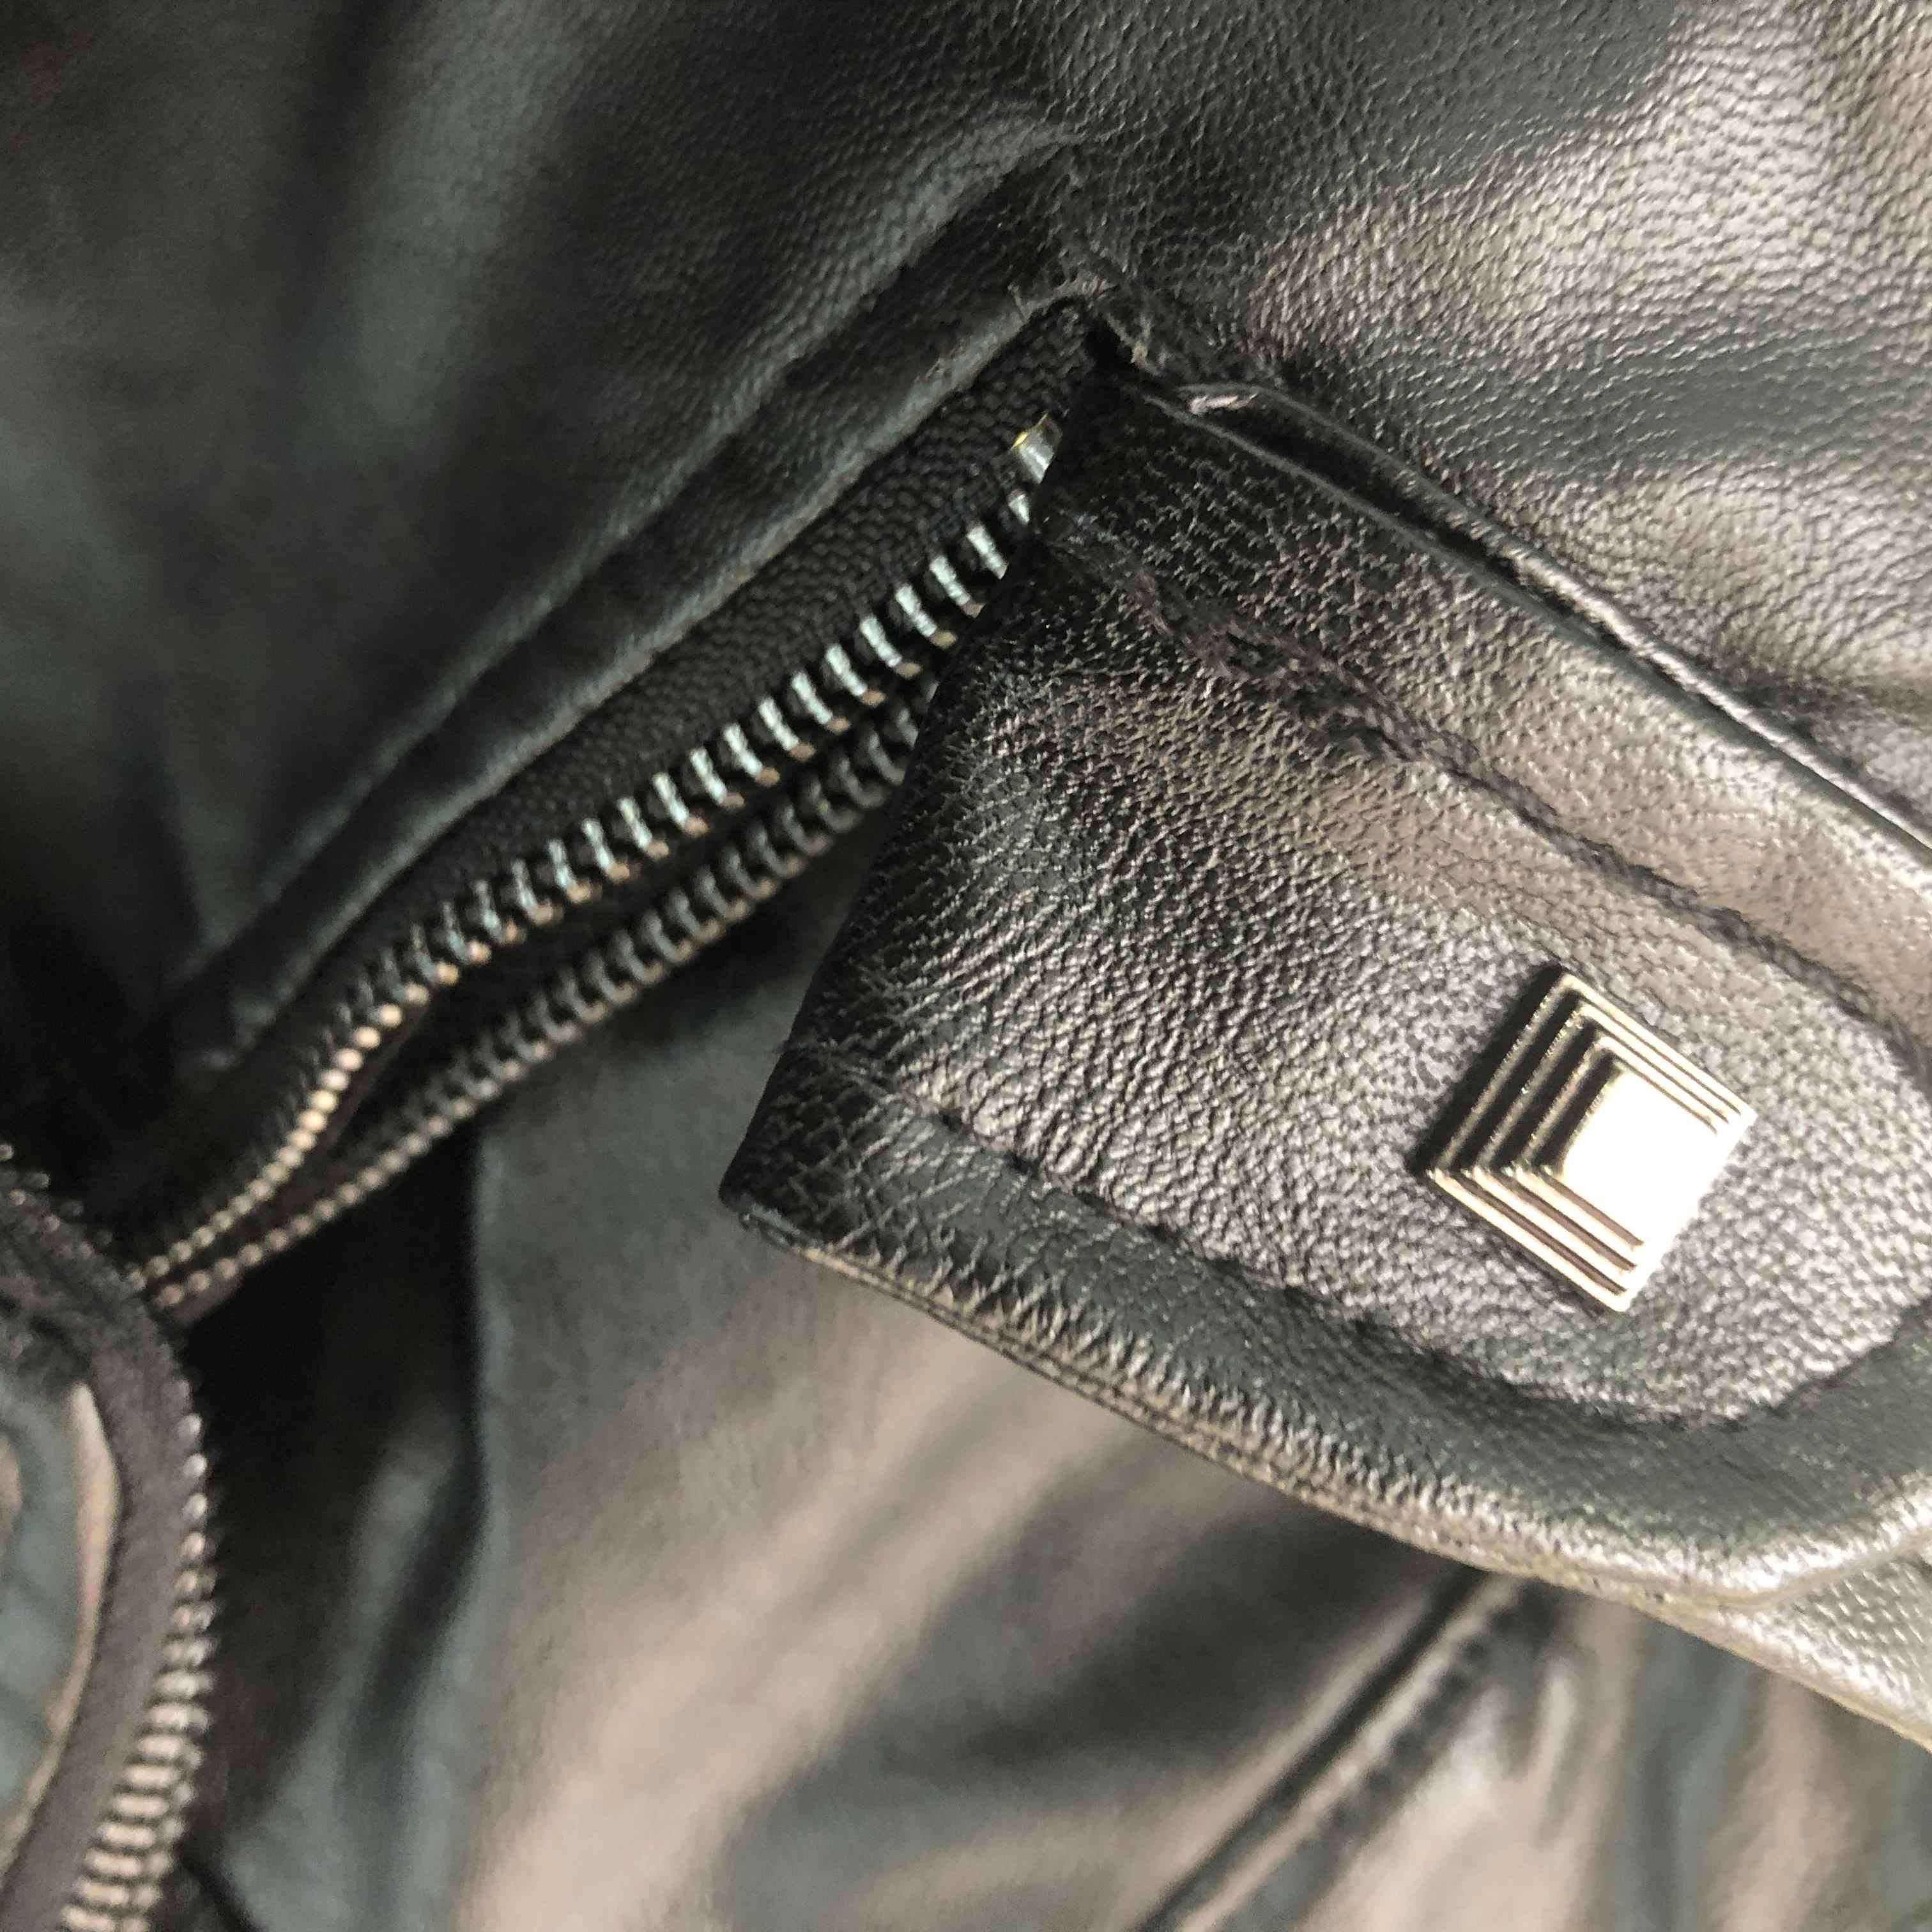 Abrigo de primavera para mujer chaqueta de moto de moda negra 2019 prendas de vestir exteriores de piel sintética PU chaqueta gótica de cuero de